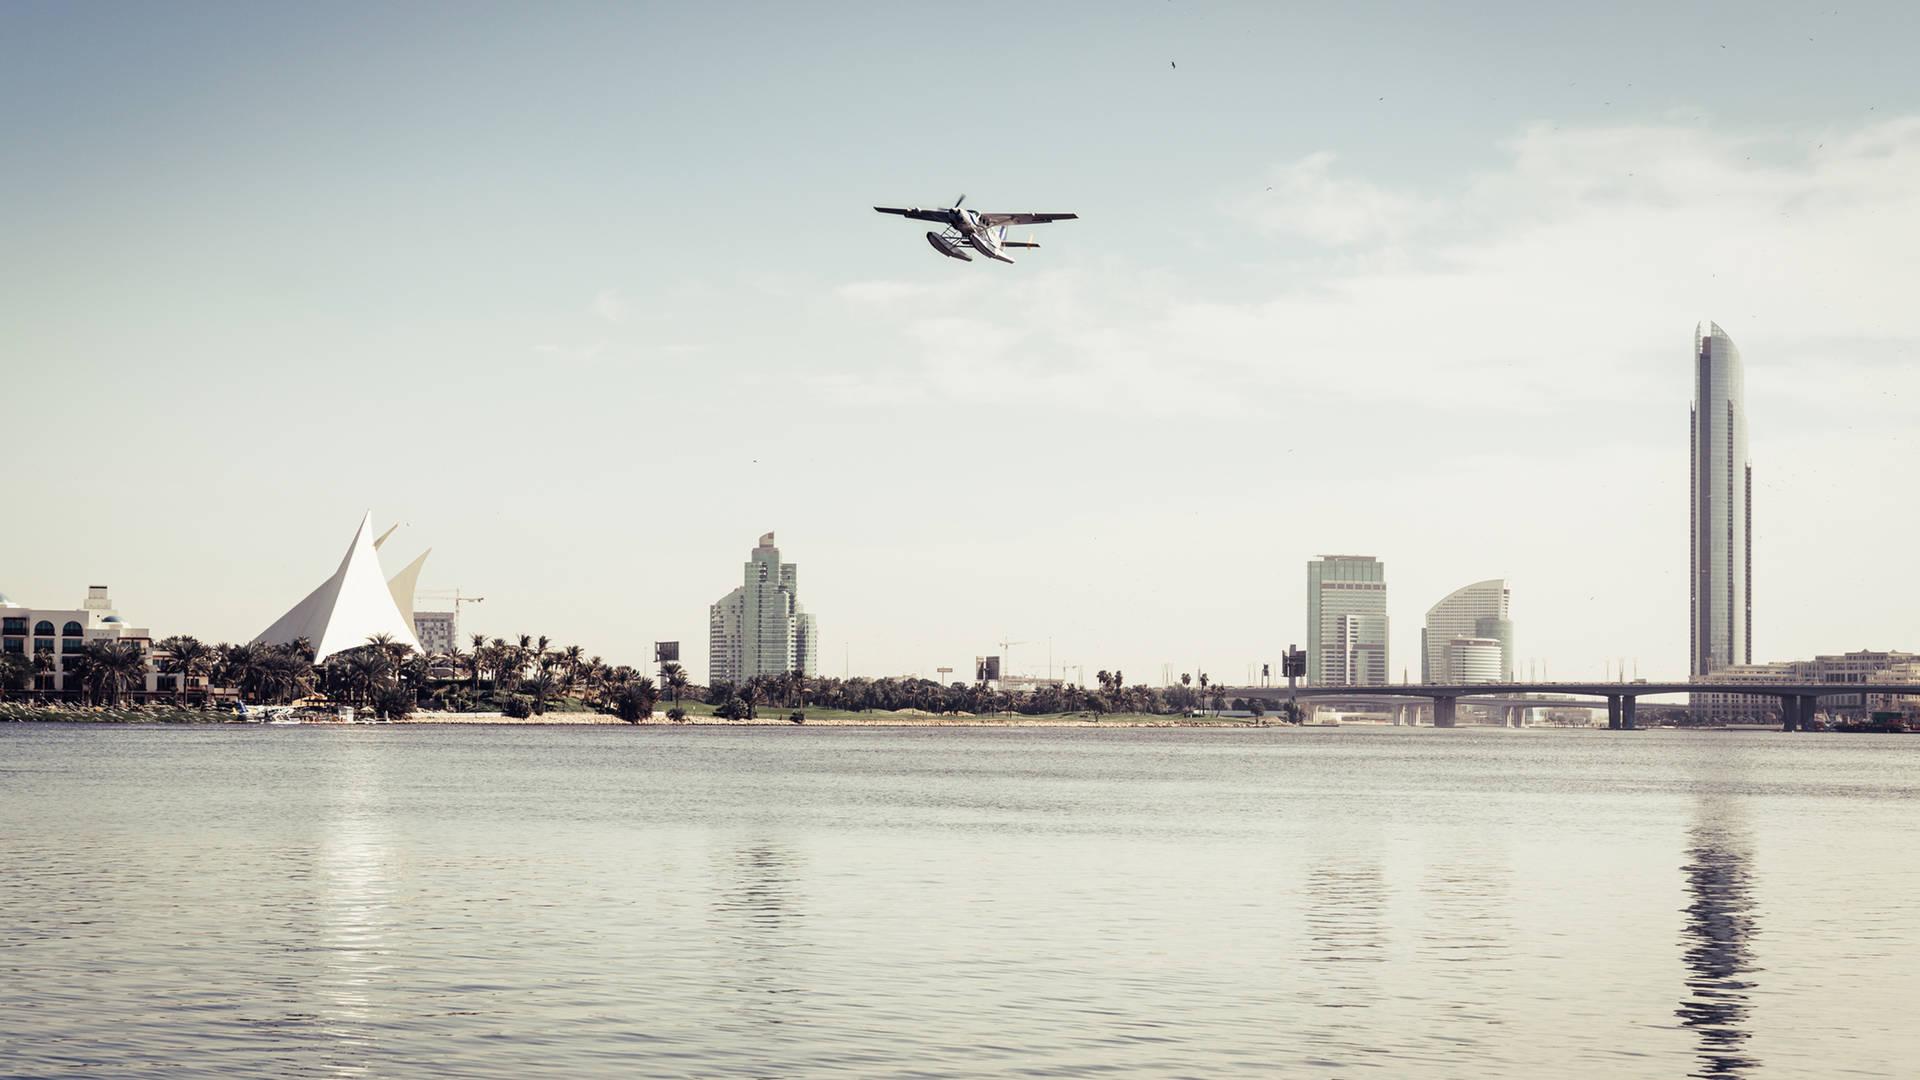 Seaplane taking off over Dubai creek